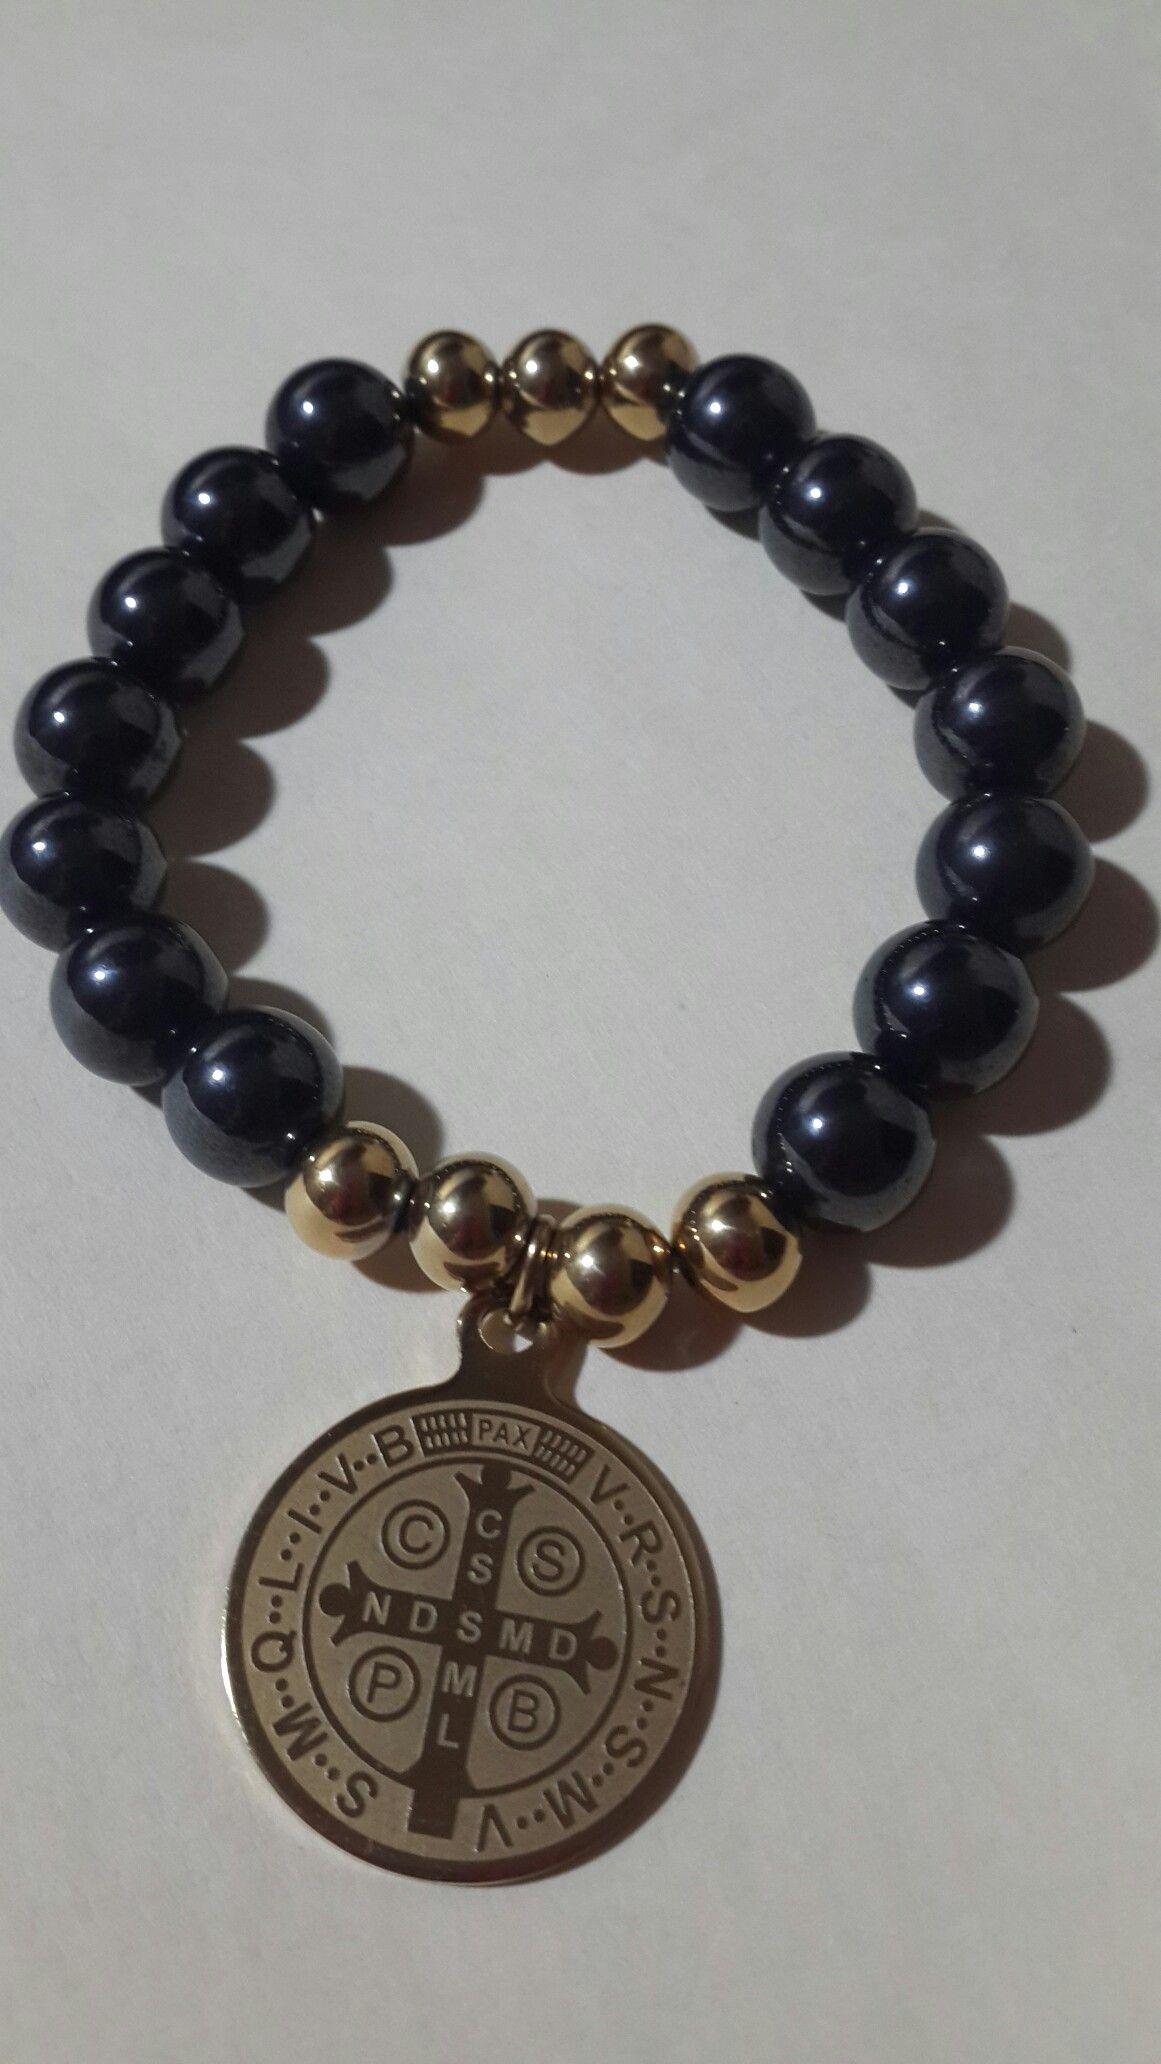 eaab13e7469 Pulsera acerina y acero inoxidable Medalla San Benito. Kml